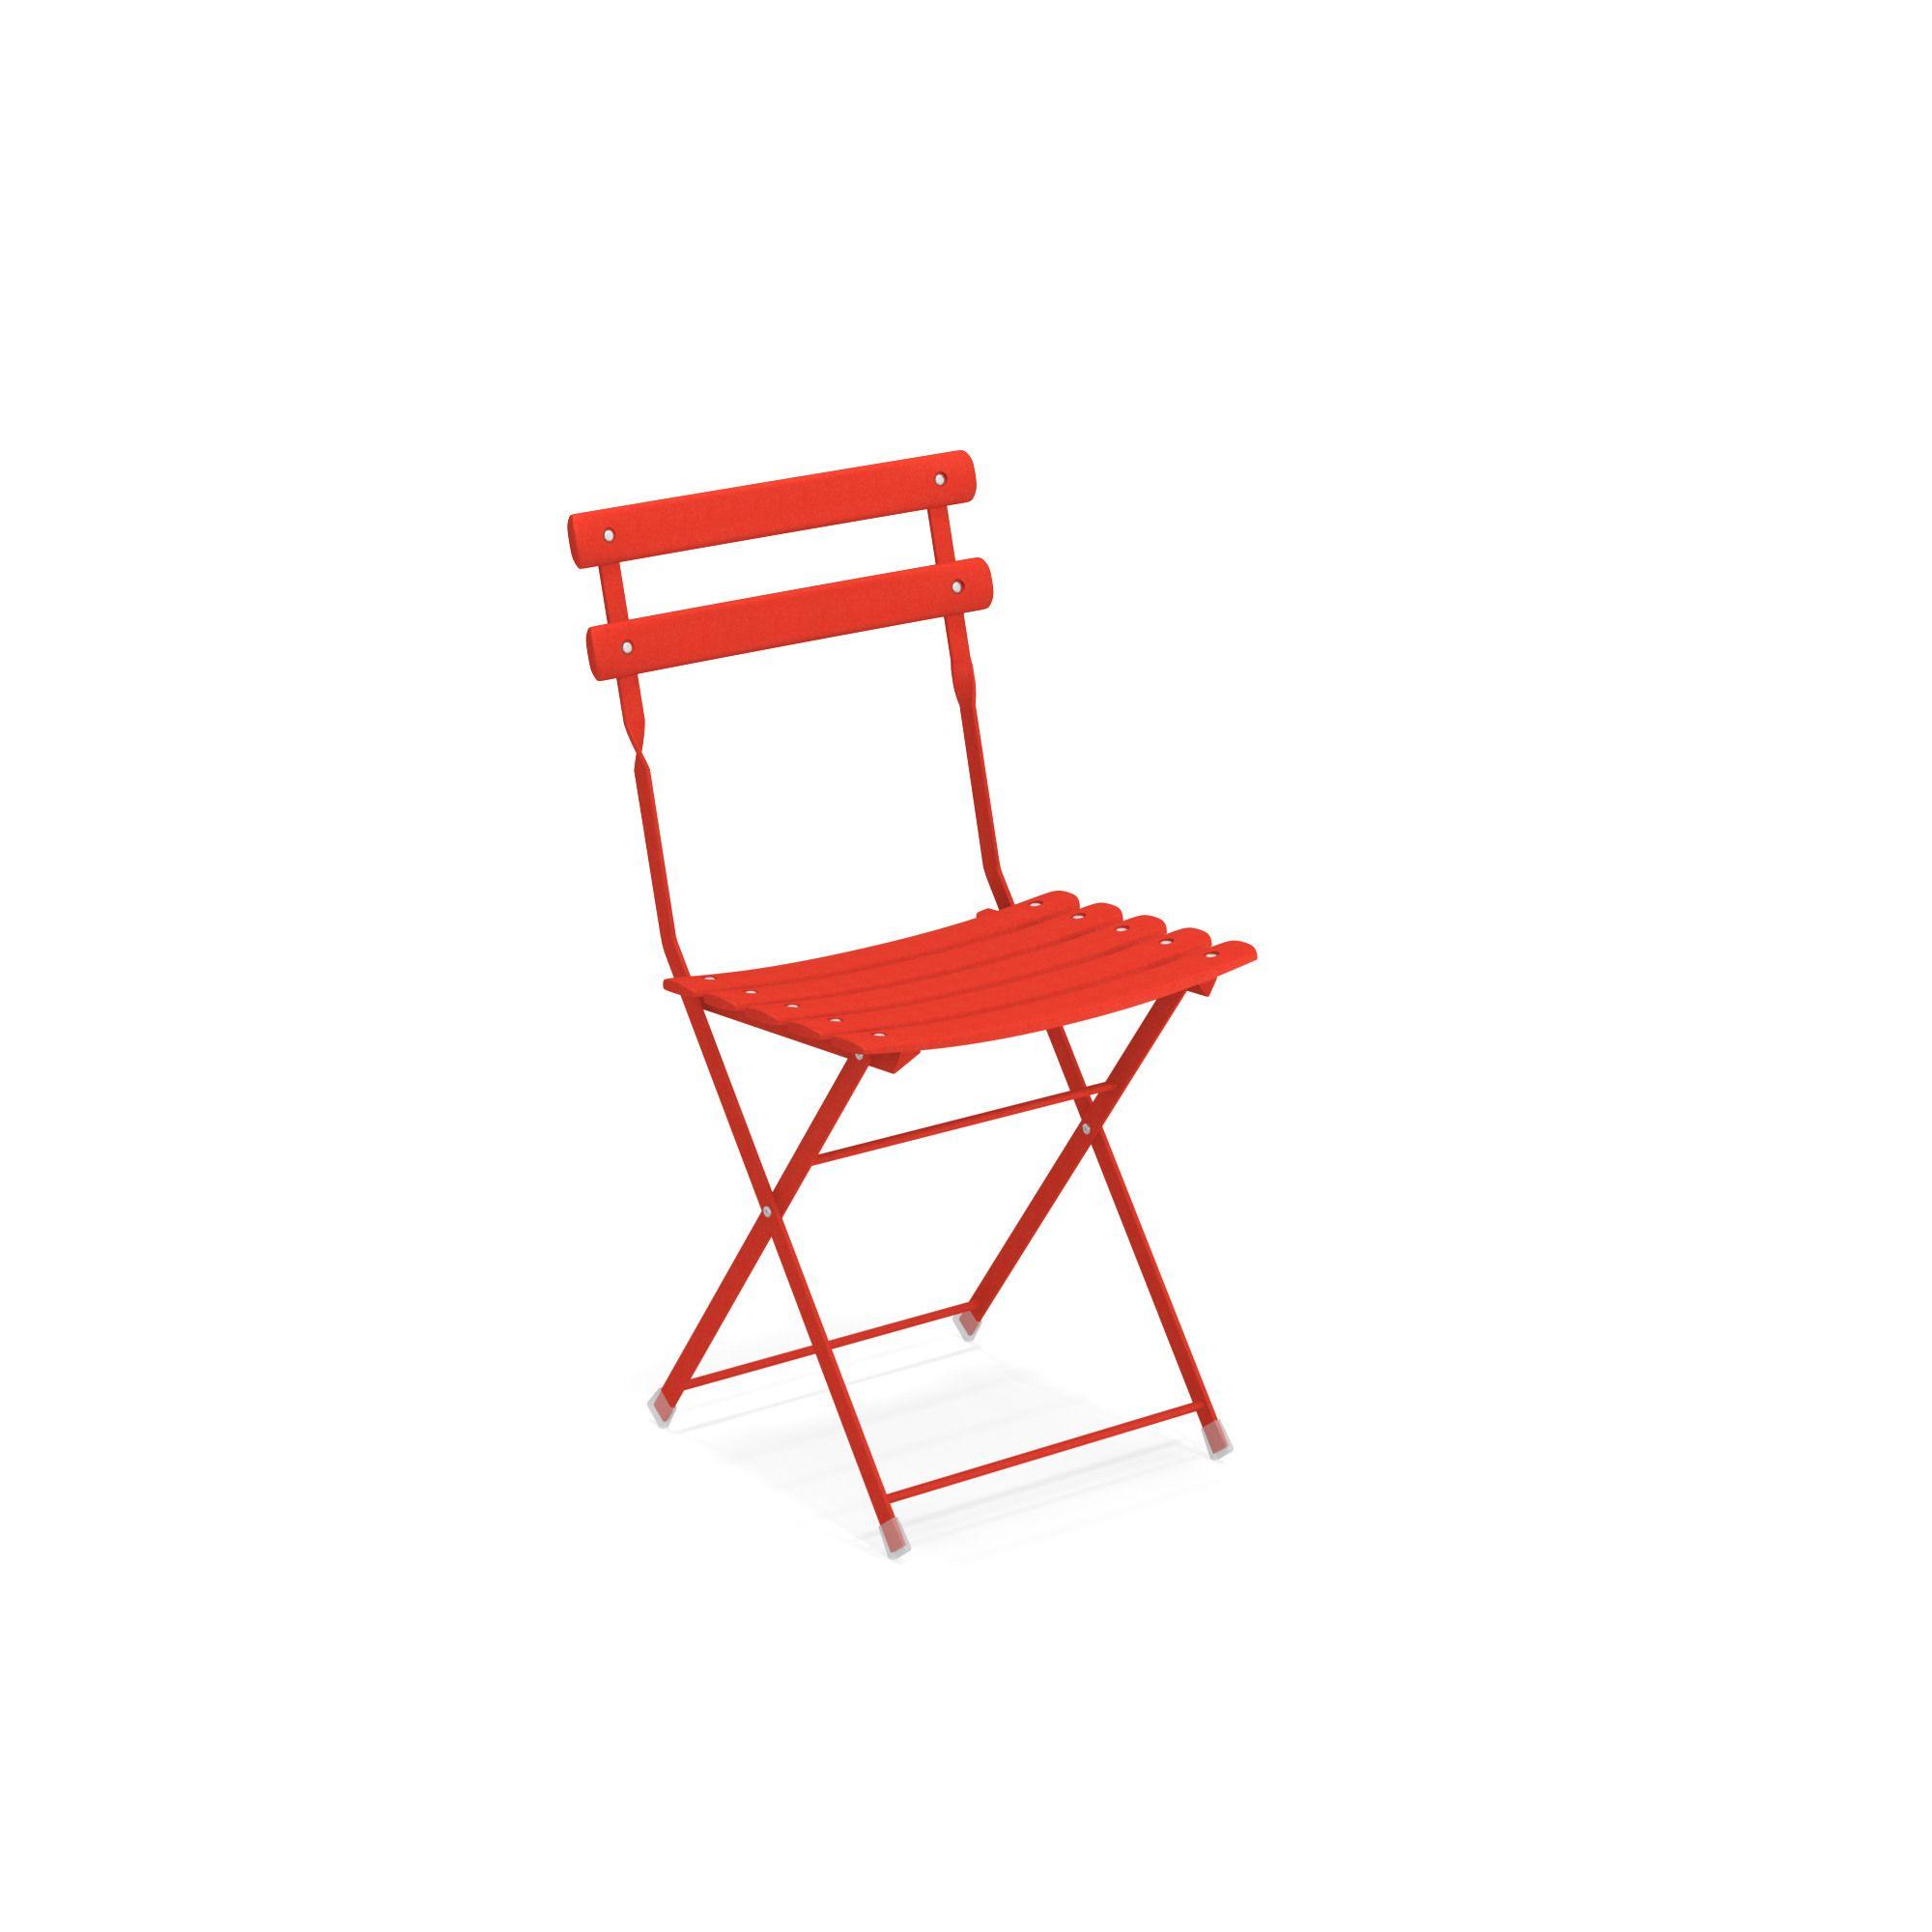 emuamericas, llc 314-50 chair, folding, outdoor